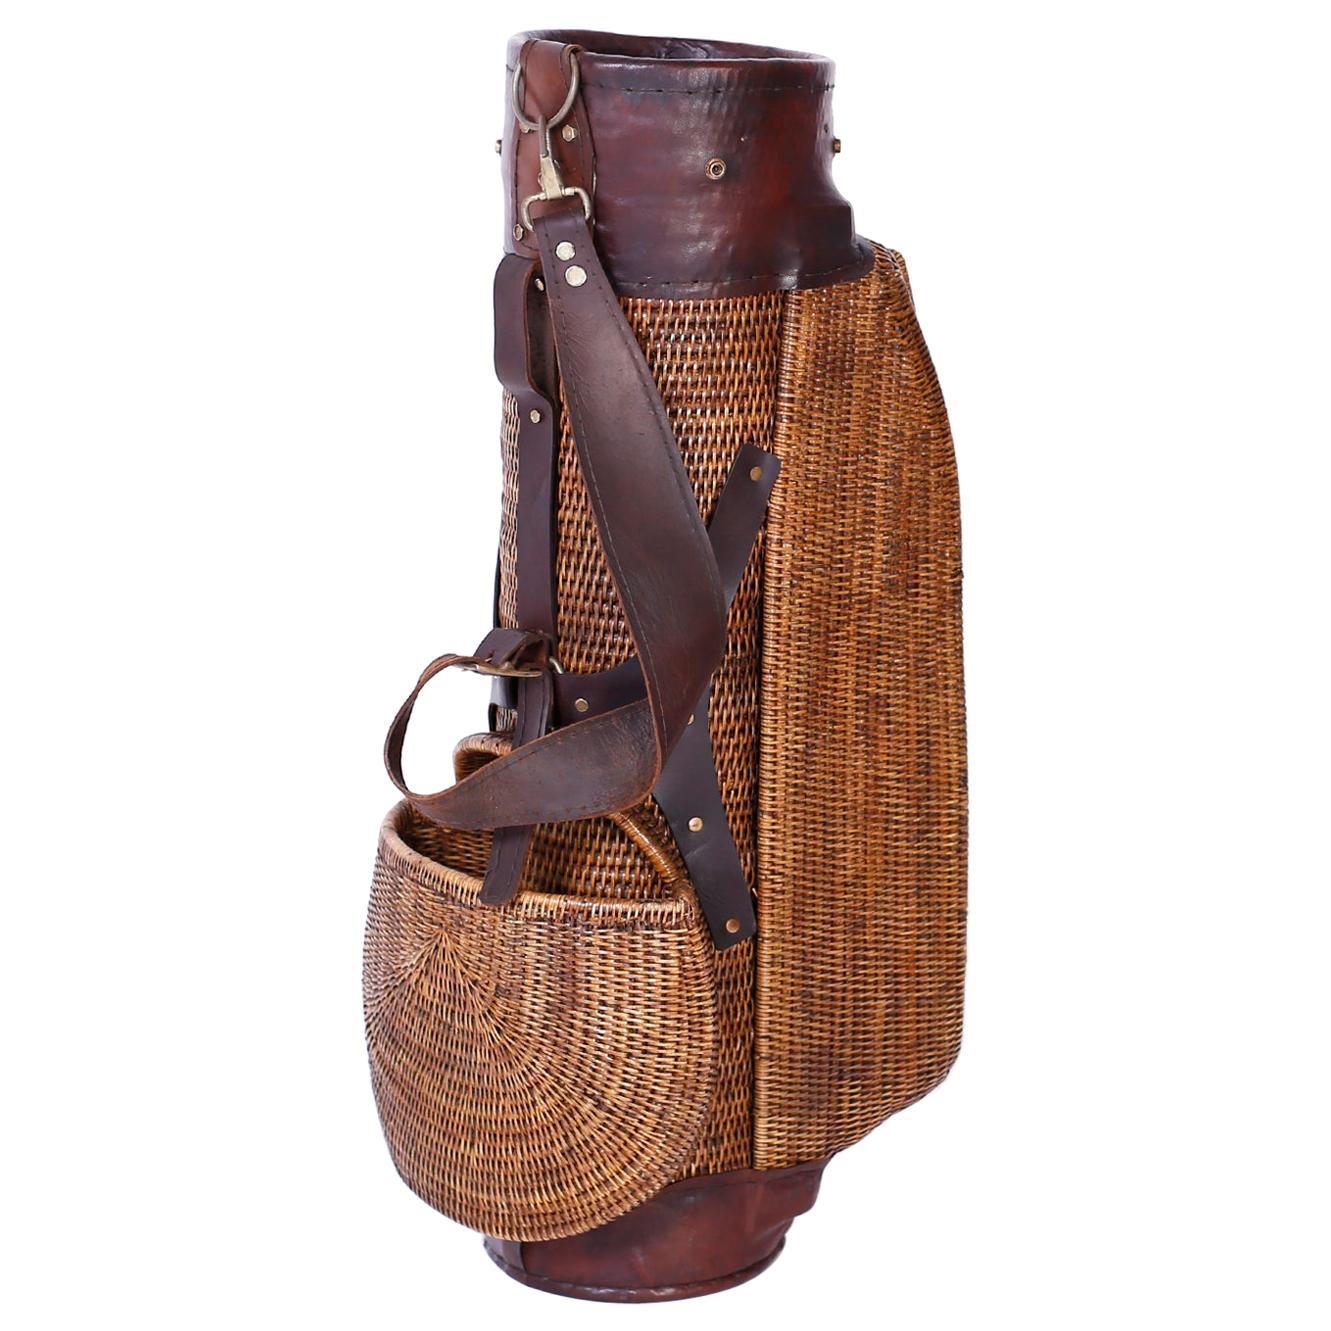 Vintage British Colonial Style Golf Bag